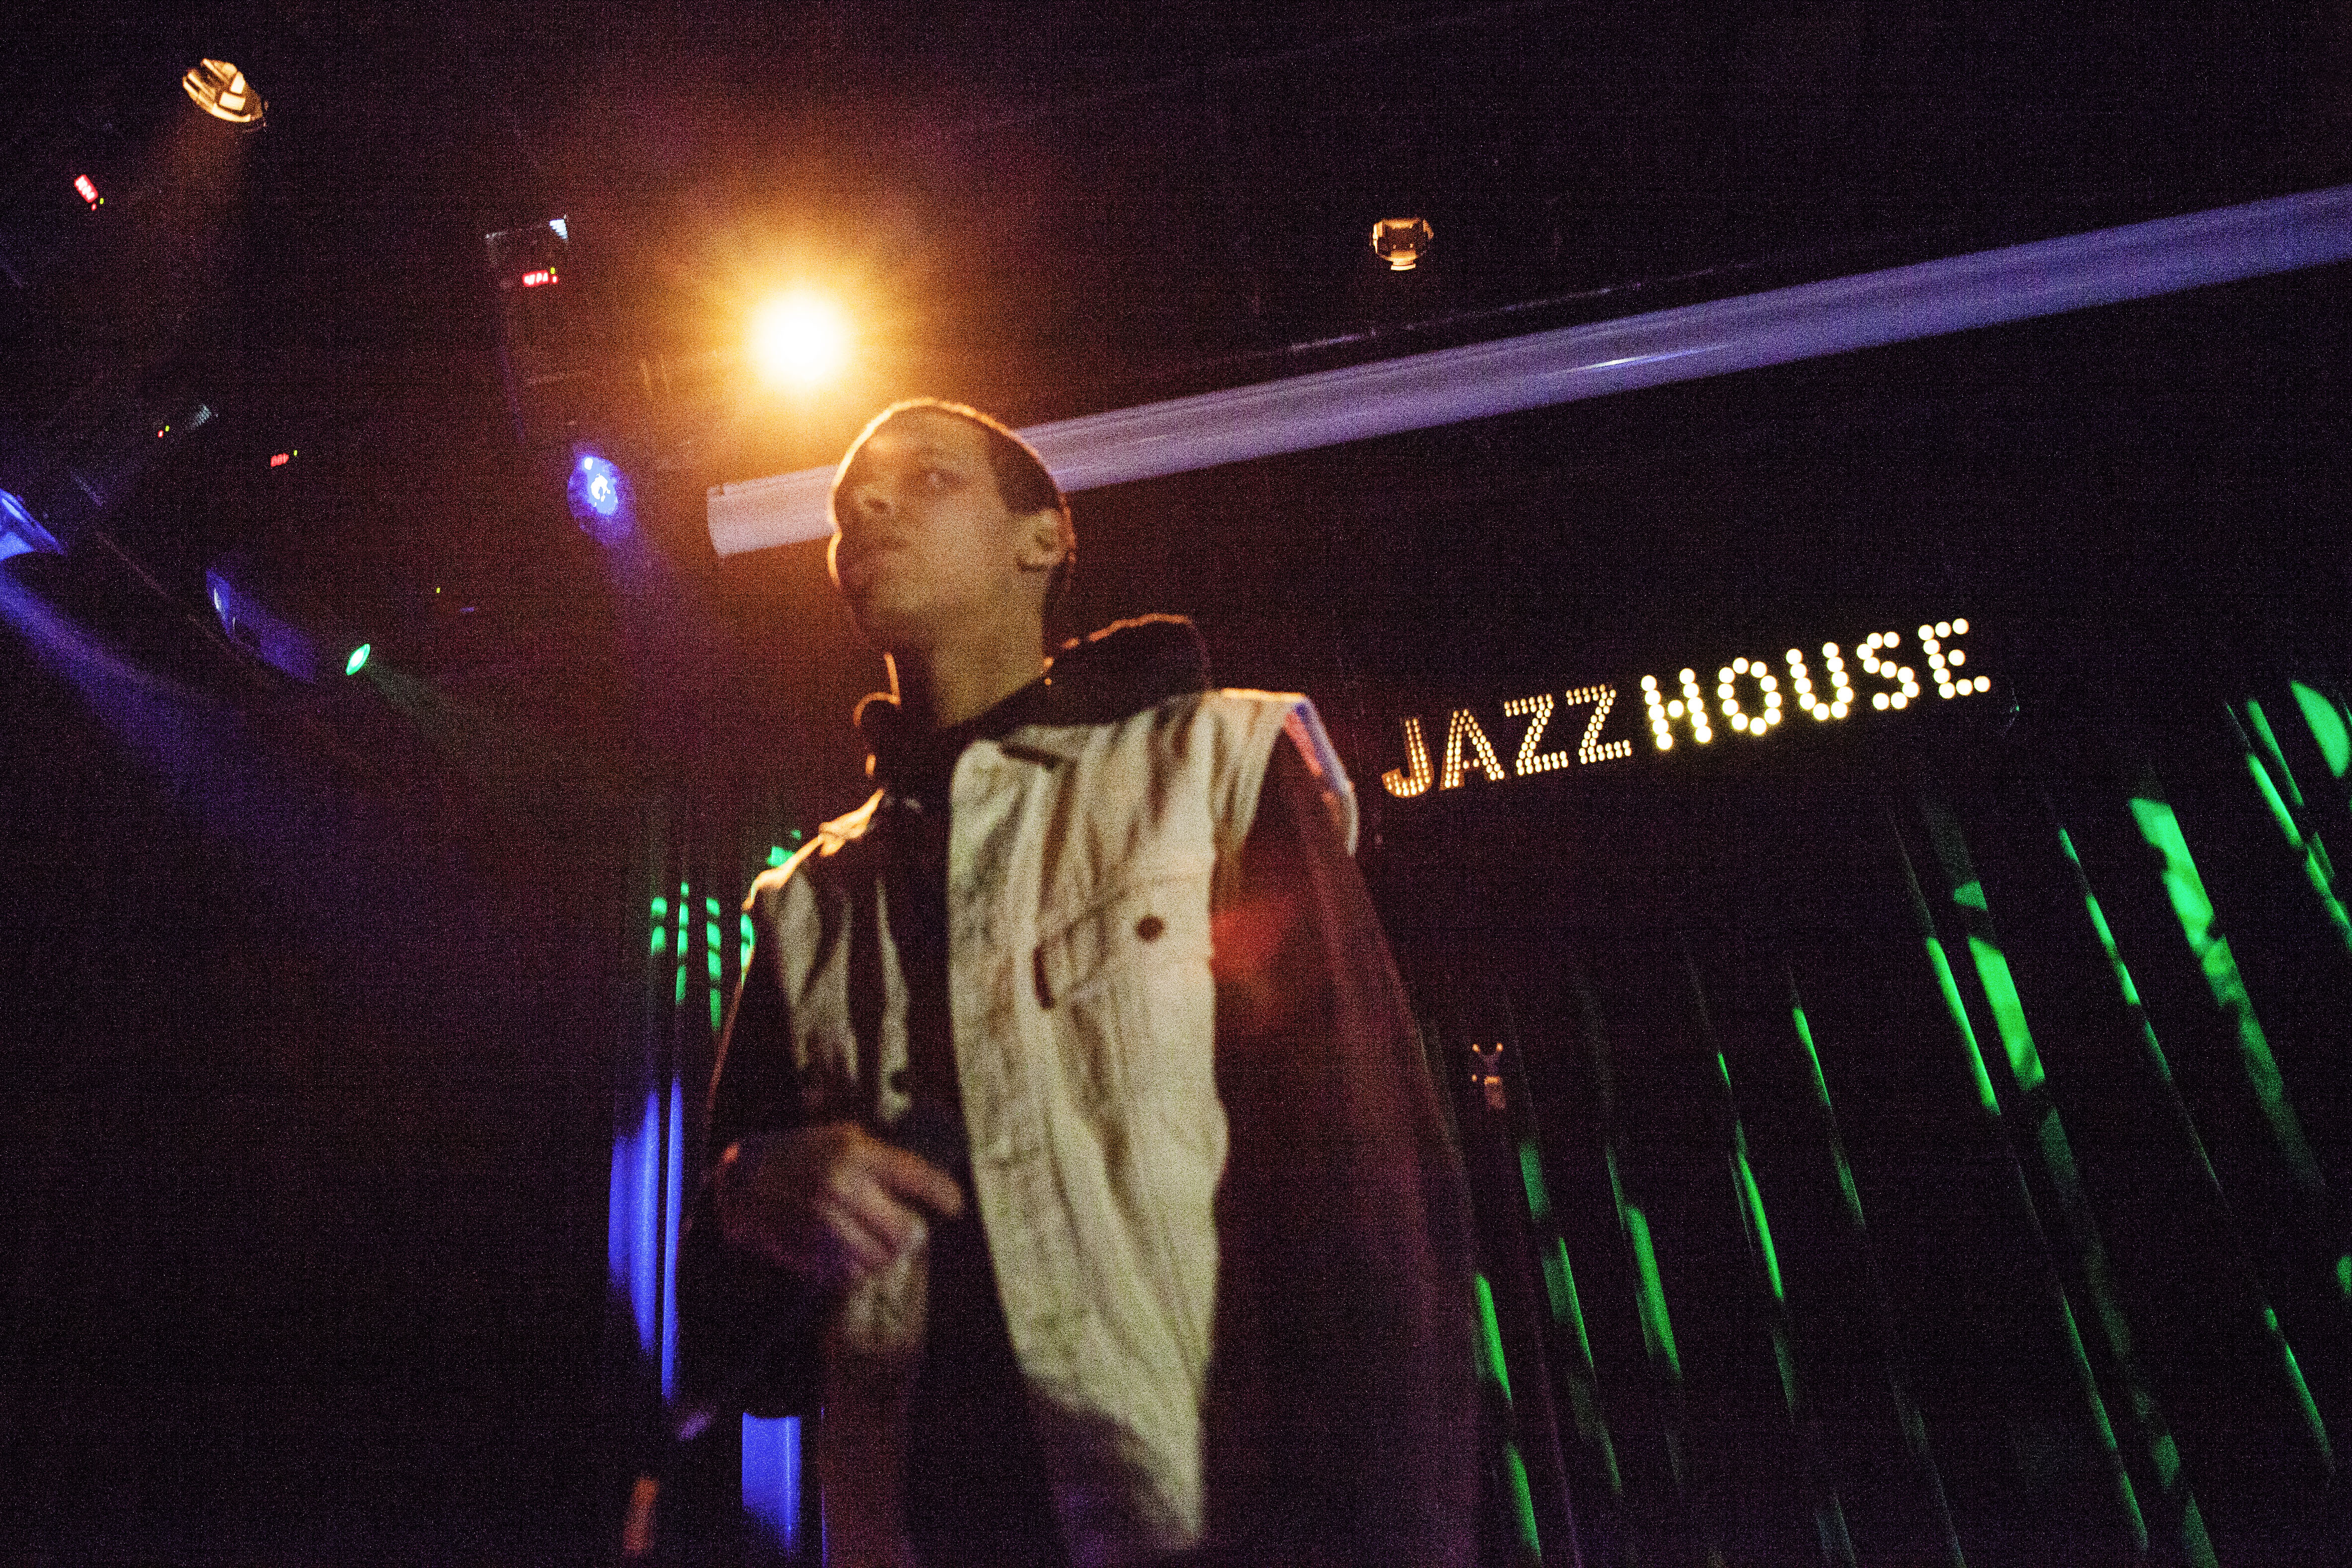 LISS_Jazzhouse_GAFFA_HelenaLundquist_low_27